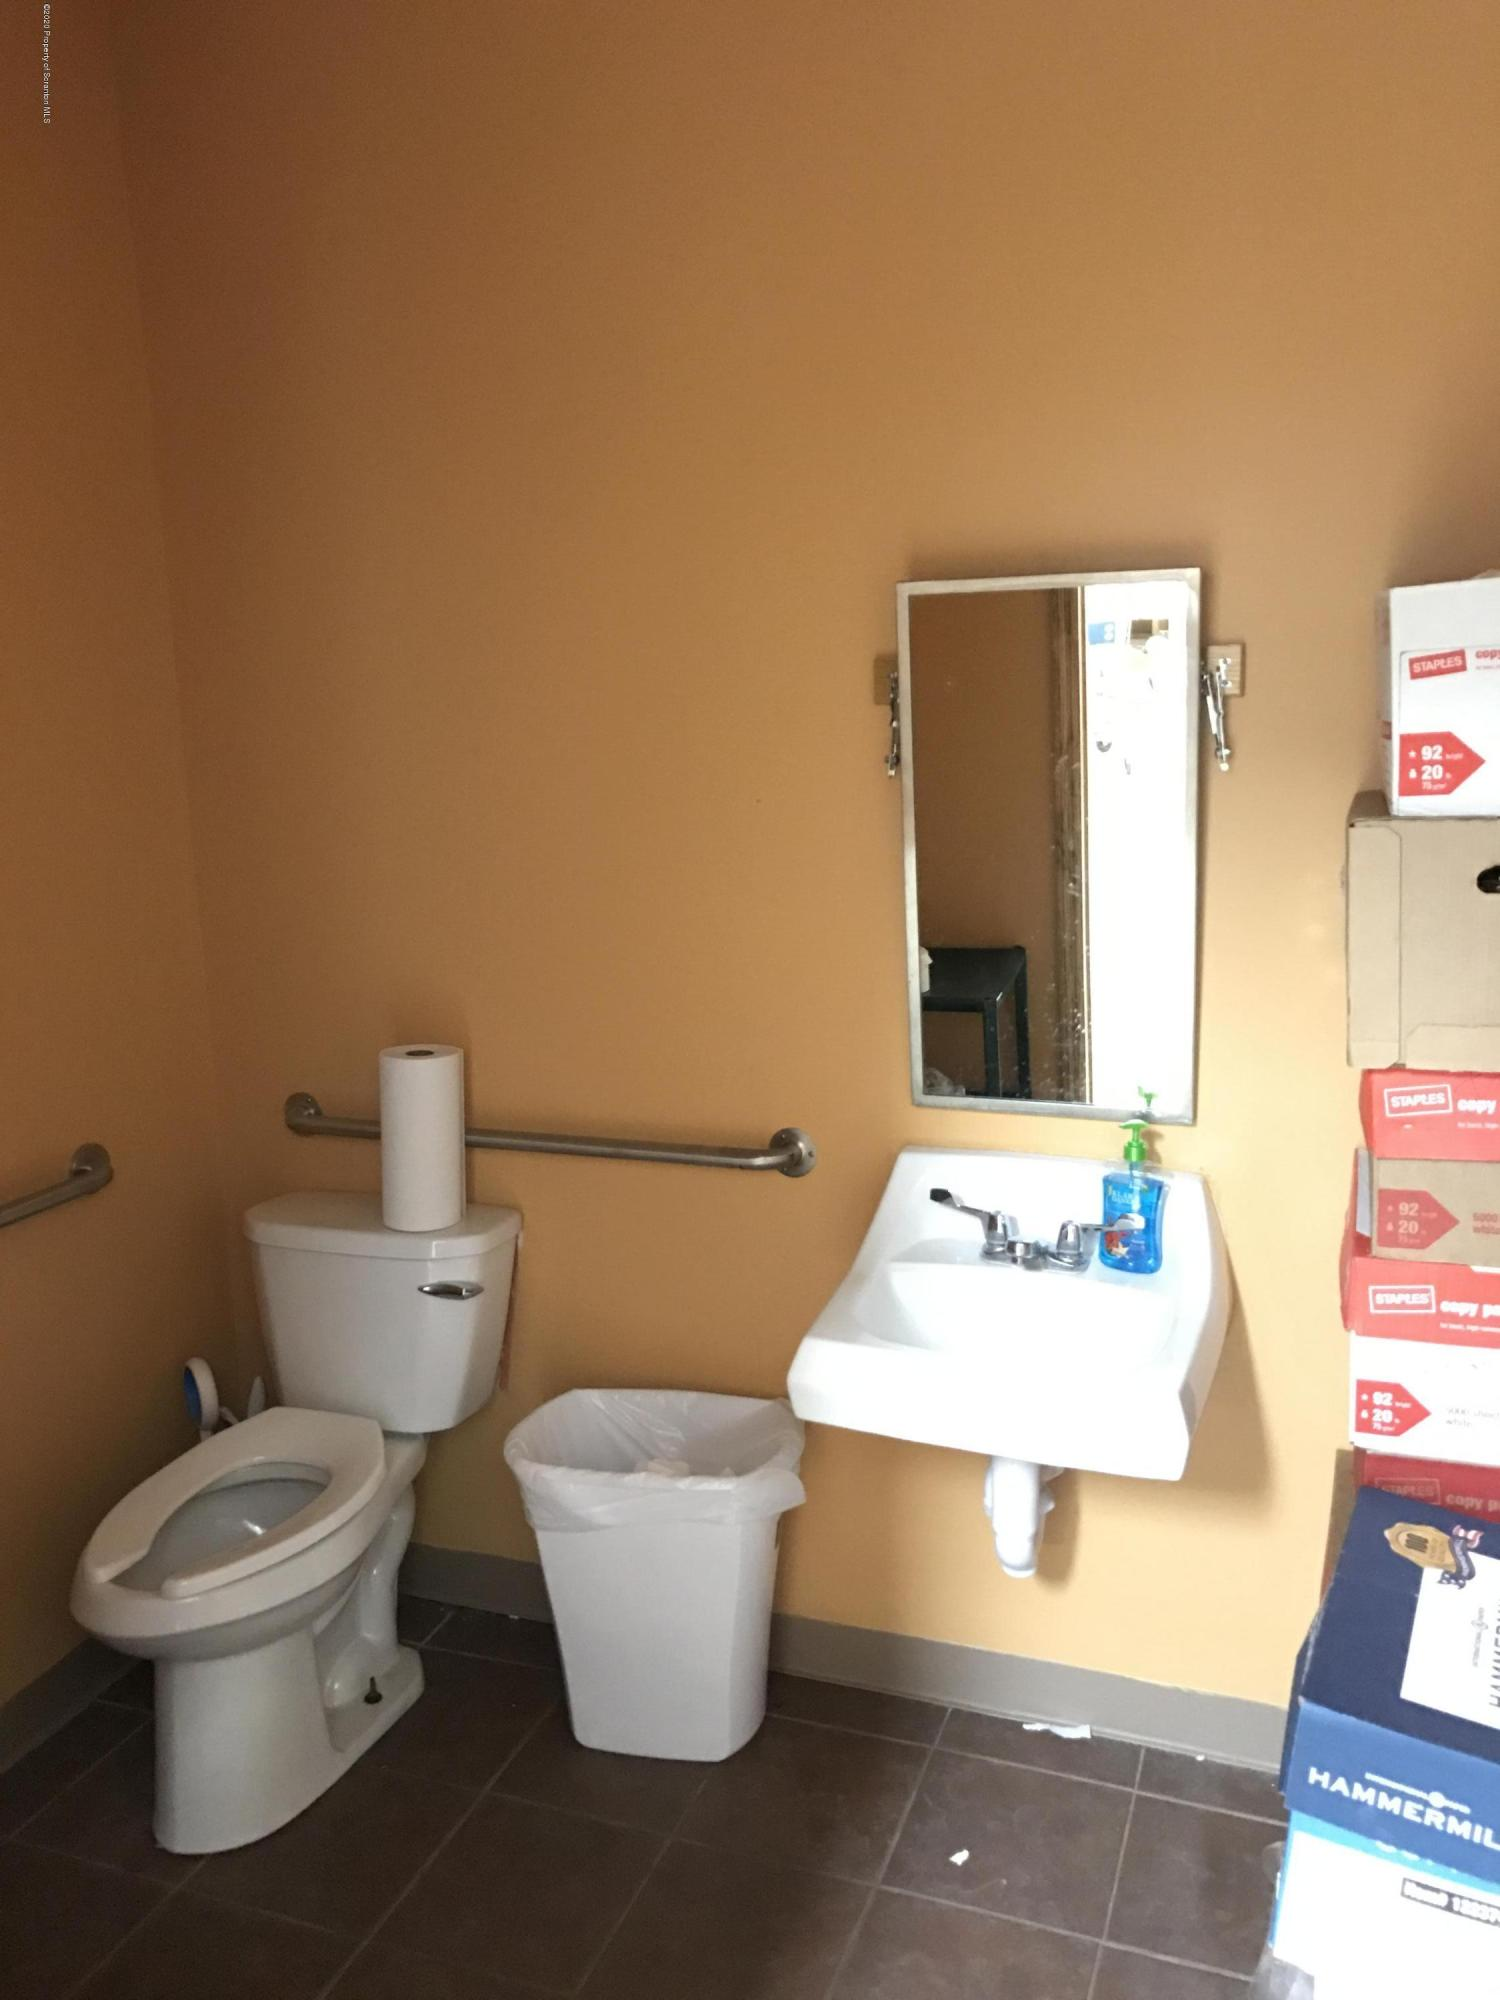 1088 Sr 307, Factoryville, Pennsylvania 18419, ,4 BathroomsBathrooms,Commercial,For Sale,Sr 307,20-709